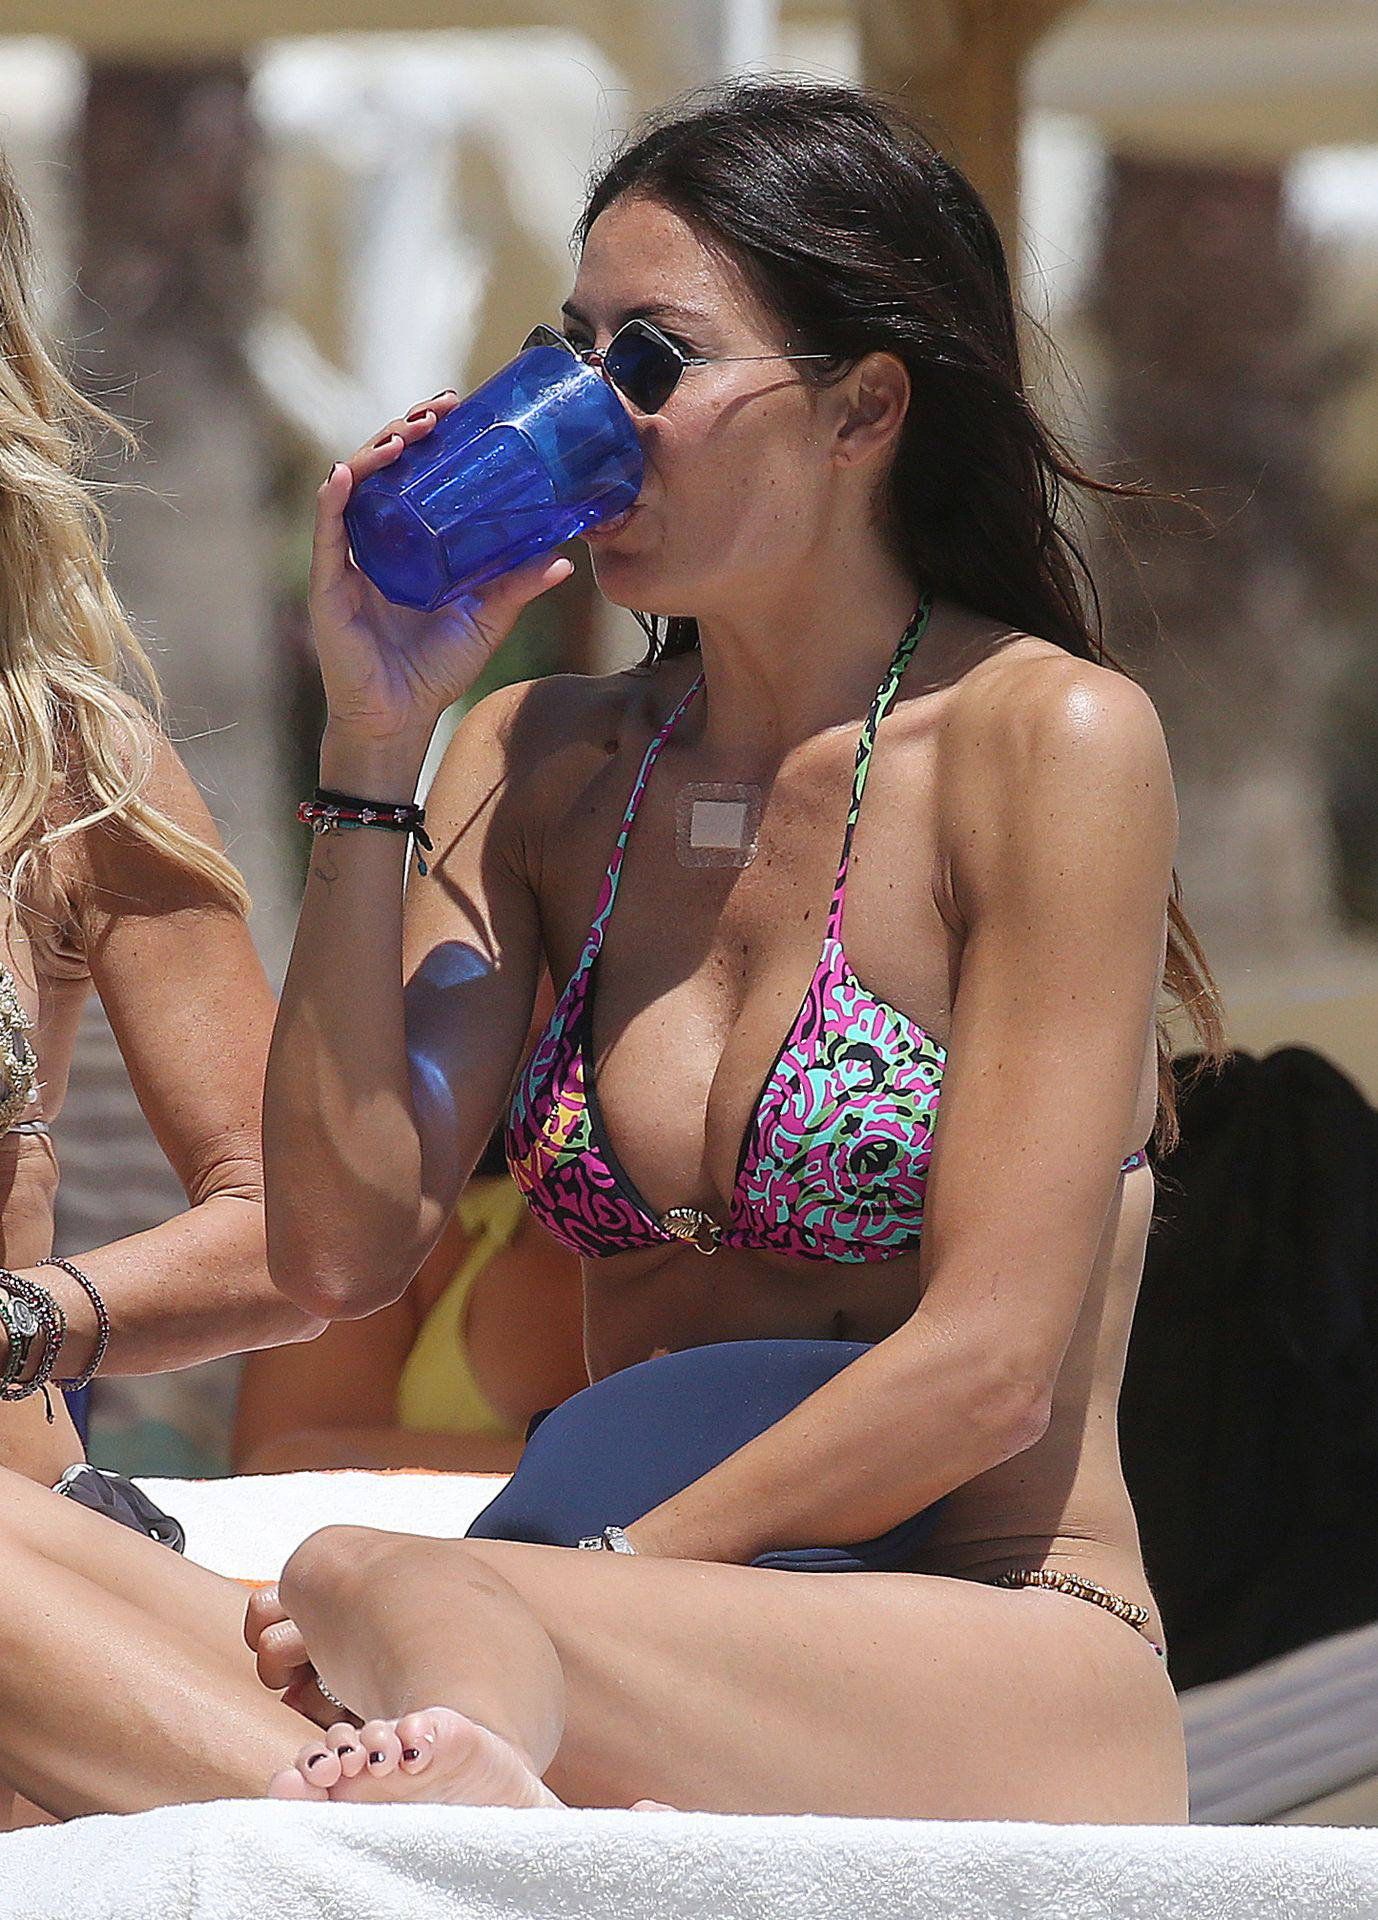 Elisabetta Gregoraci – Sexy Boobs And Ass In A Bikini At The Beach In Miami Beach 0006